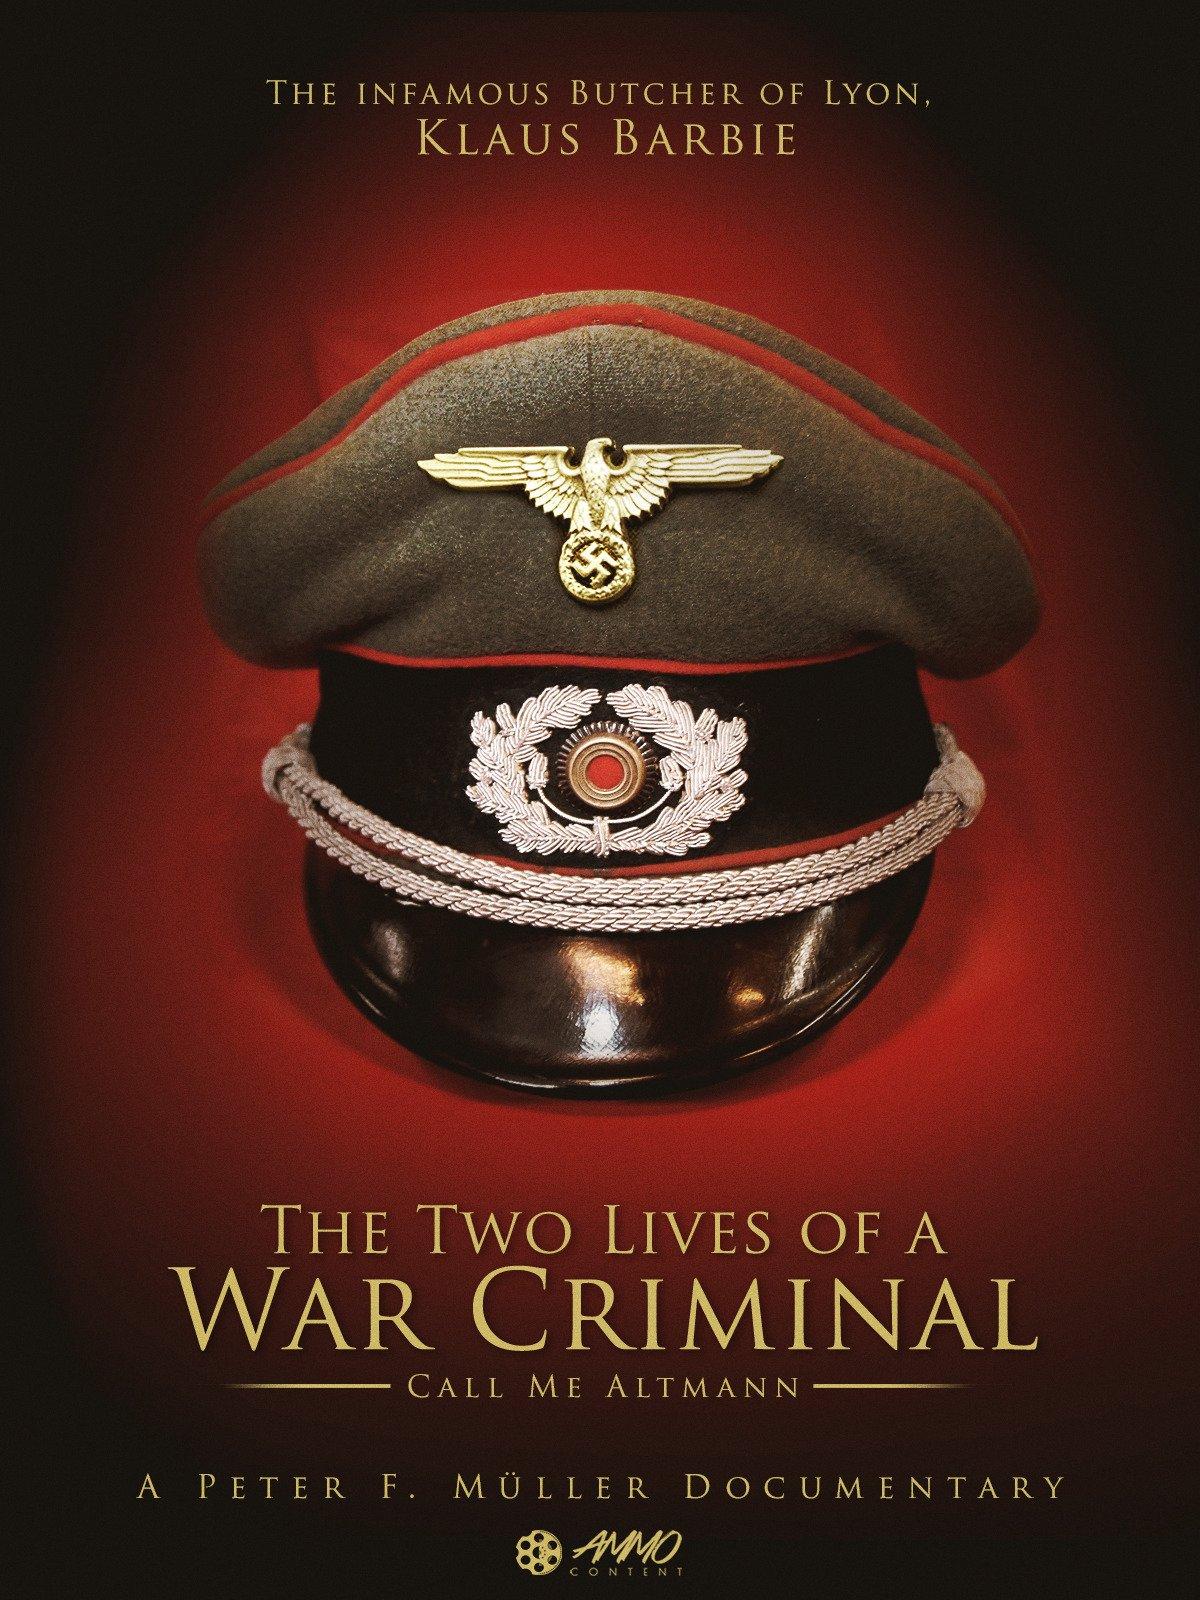 Call me Altmann: The Two Lives Of A War Criminal